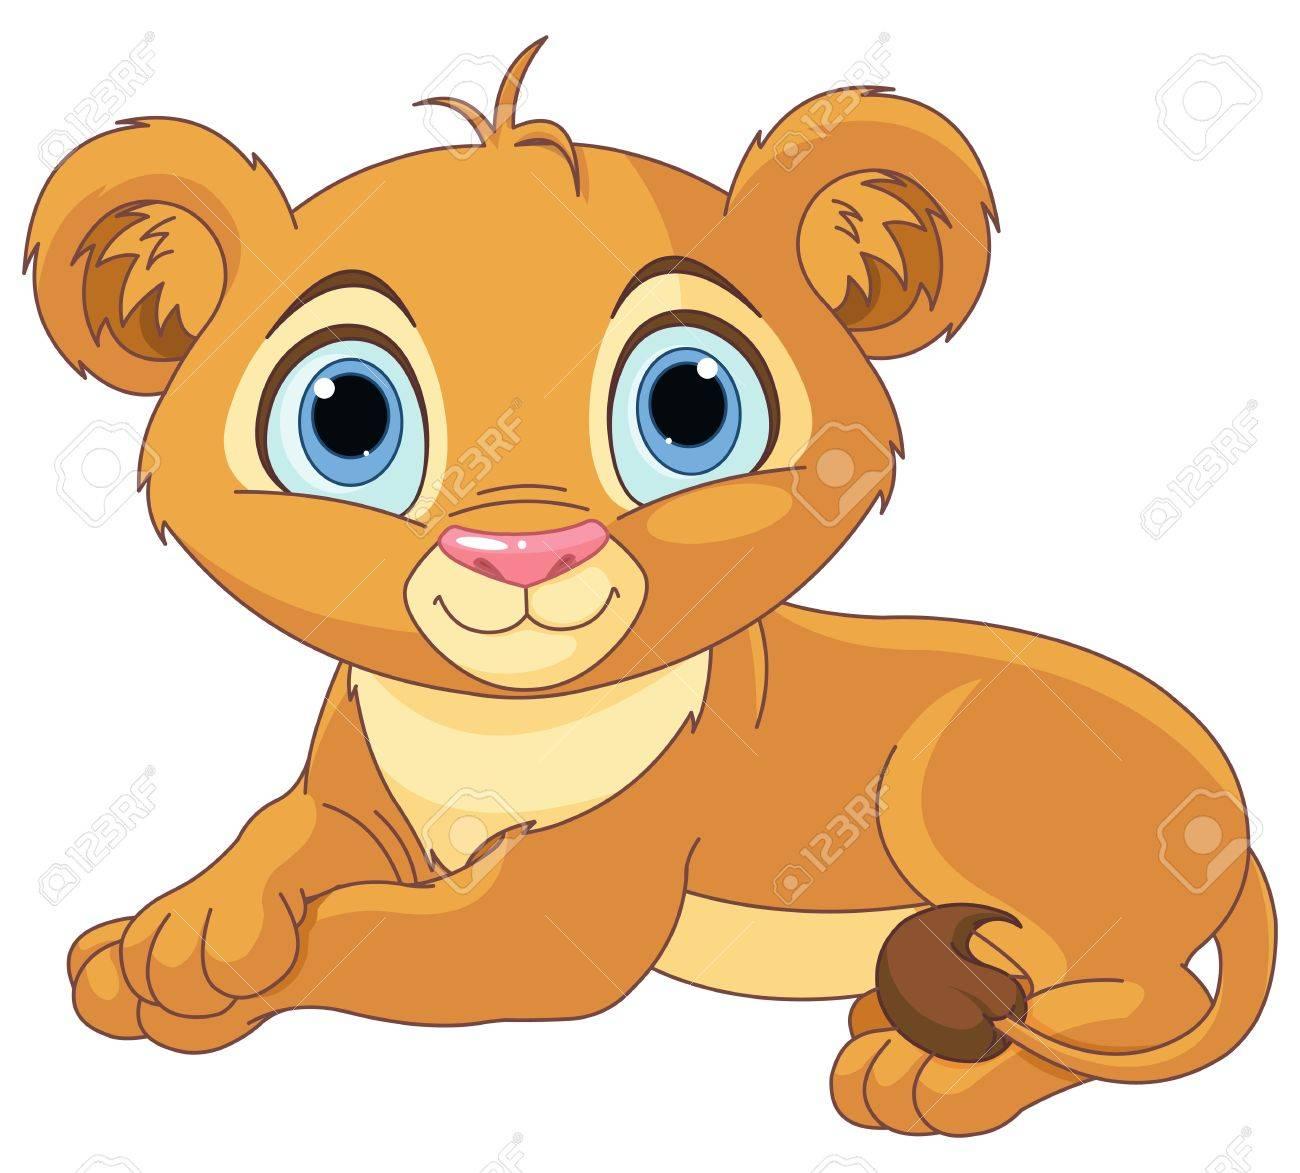 image of resting little lion cub royalty free cliparts vectors and rh 123rf com free lion cub clipart lion cub scout clipart